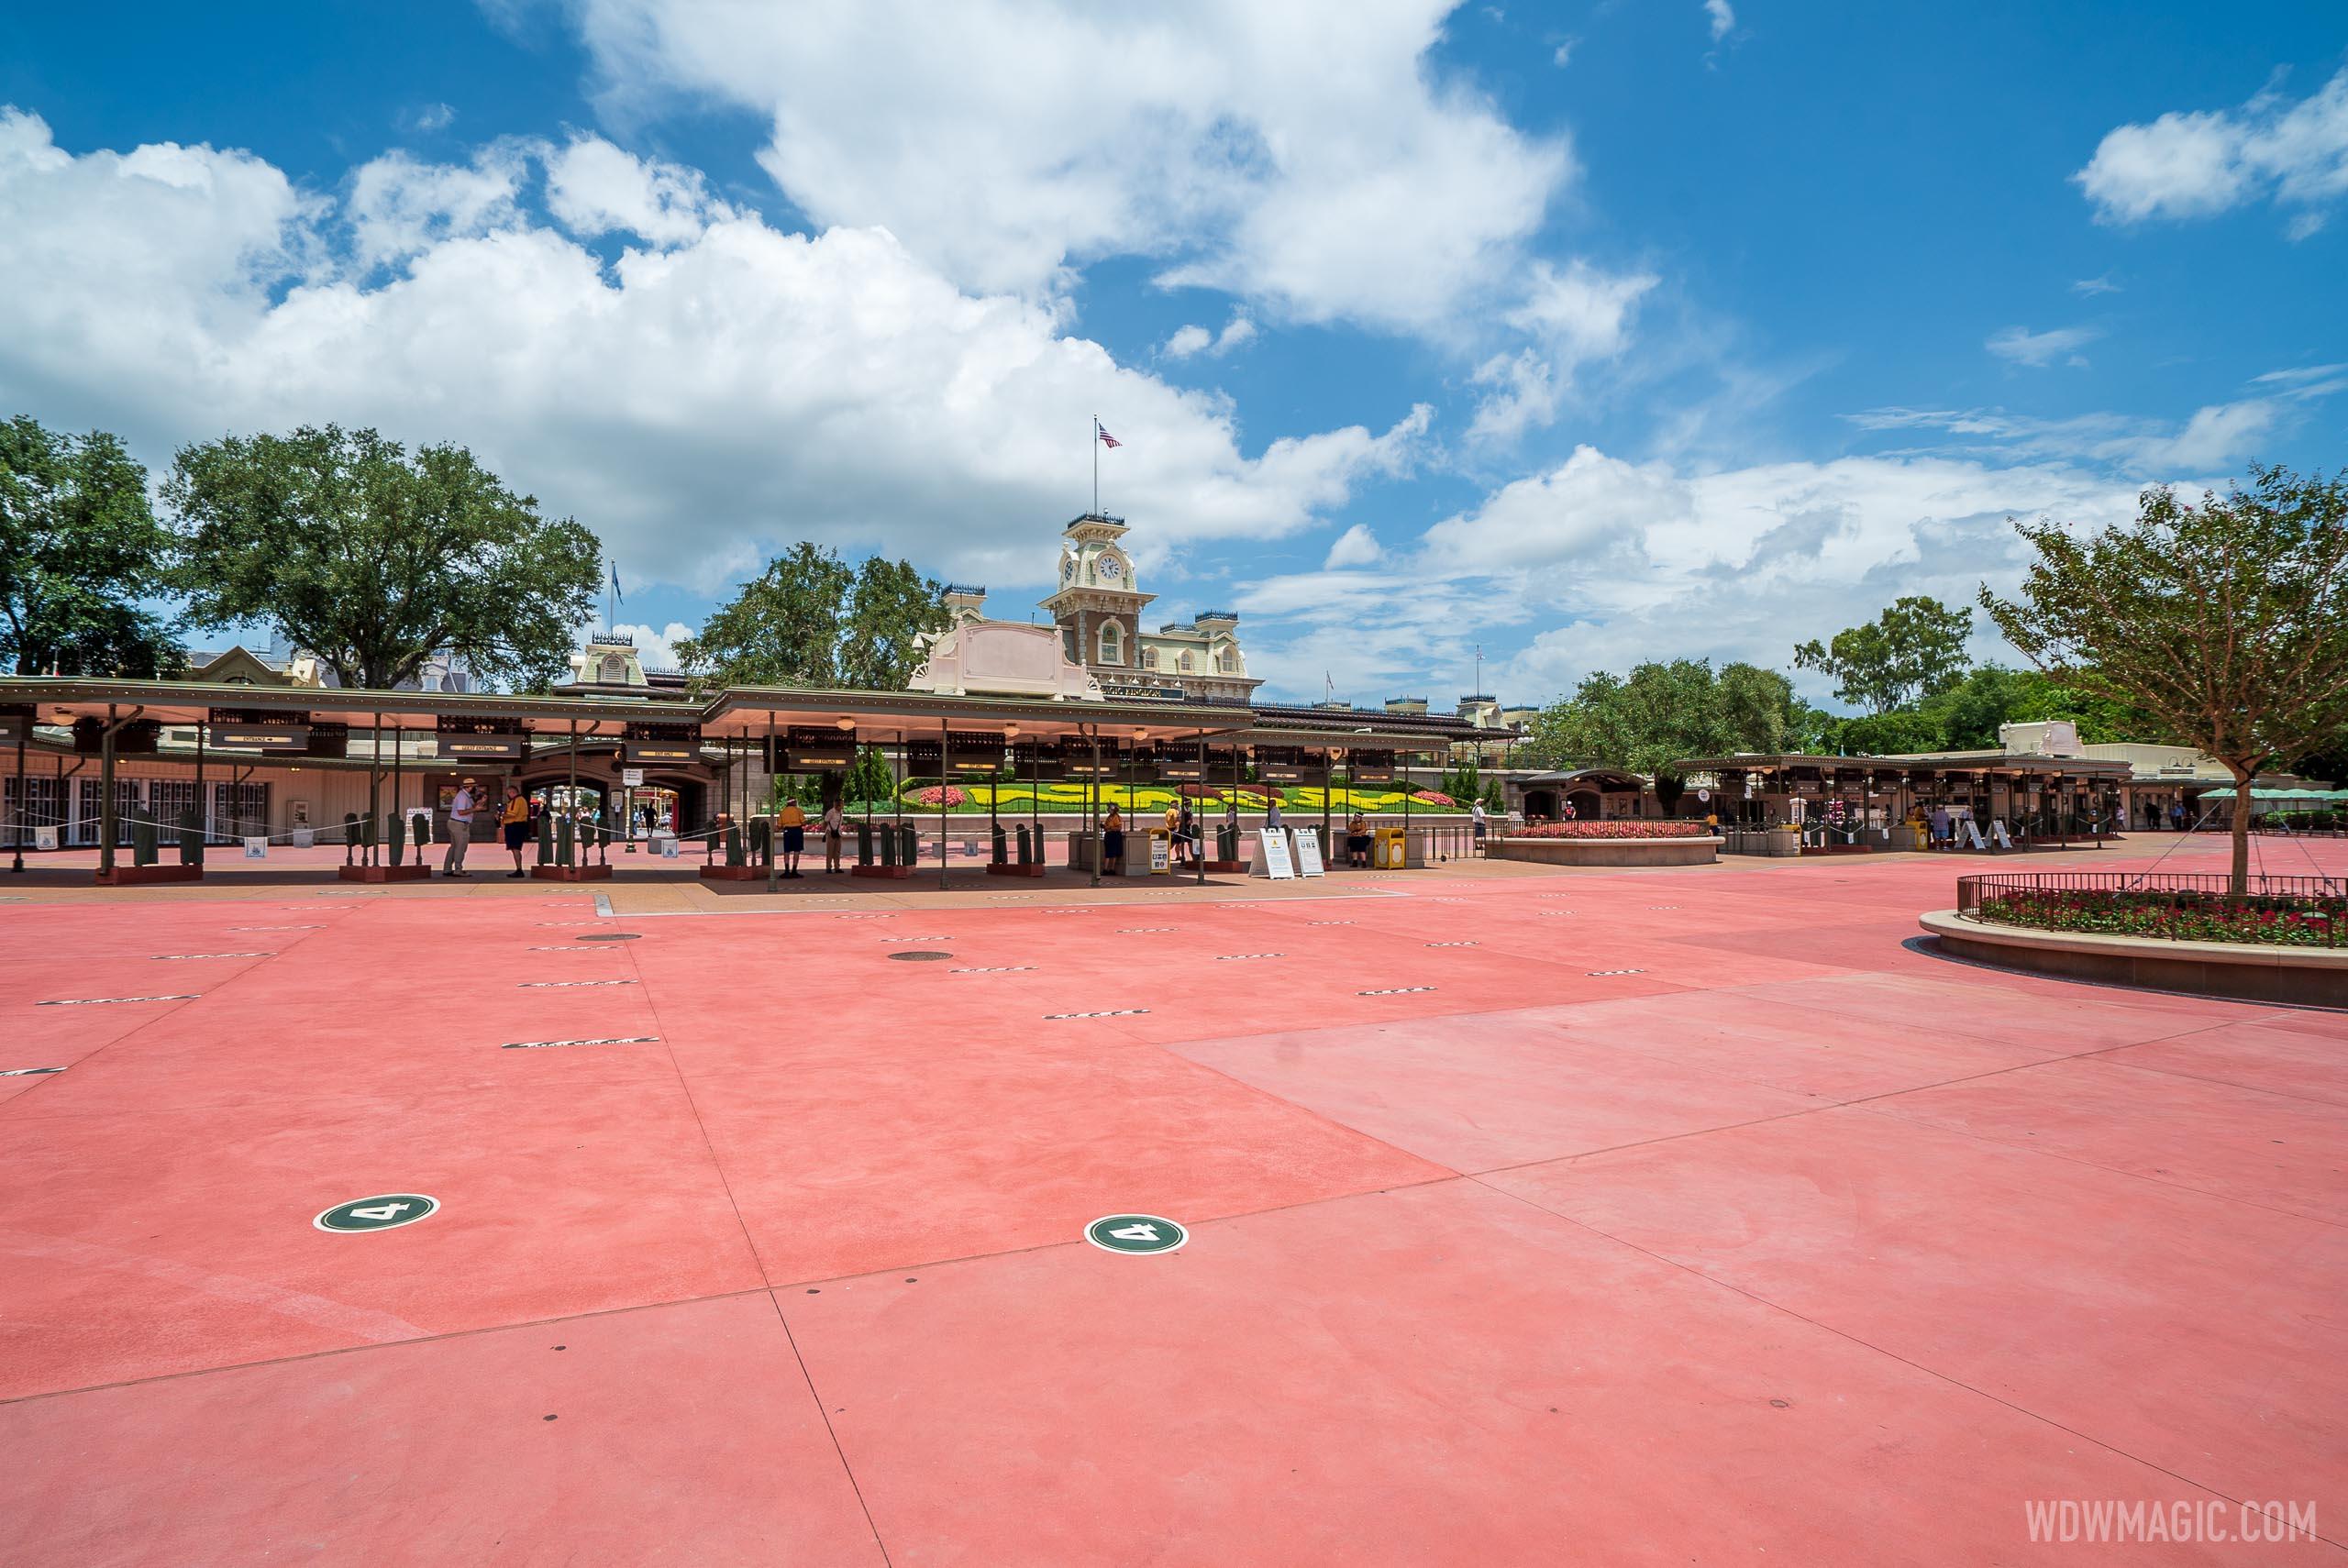 Walt Disney World began its phased reopening on July 11 2020